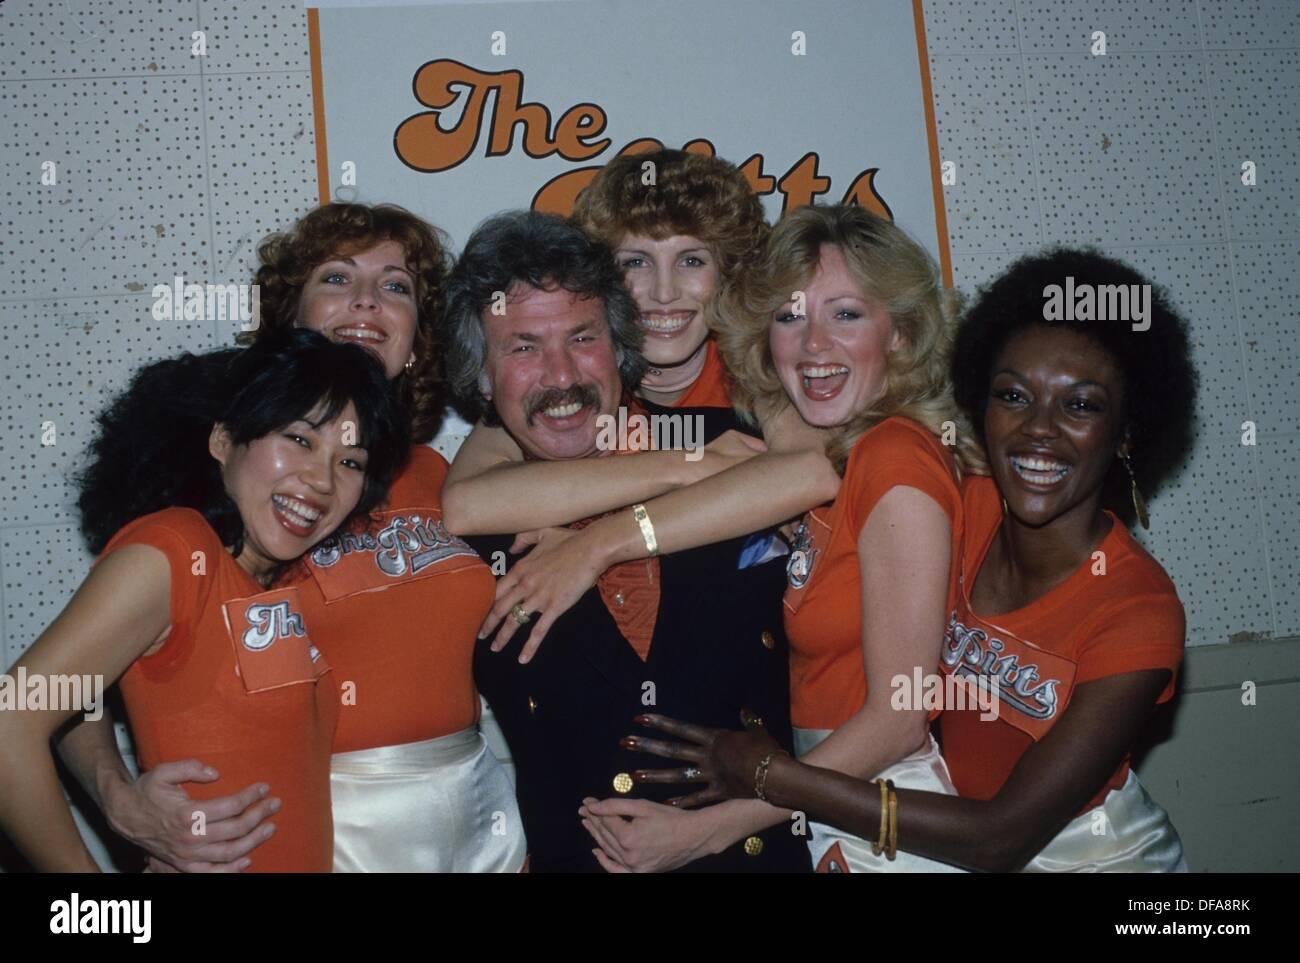 Patsy Byrne (1933?014),Cleo Ridgely Porno pics & movies Jill Wagner,Summer Strallen (born 1985)